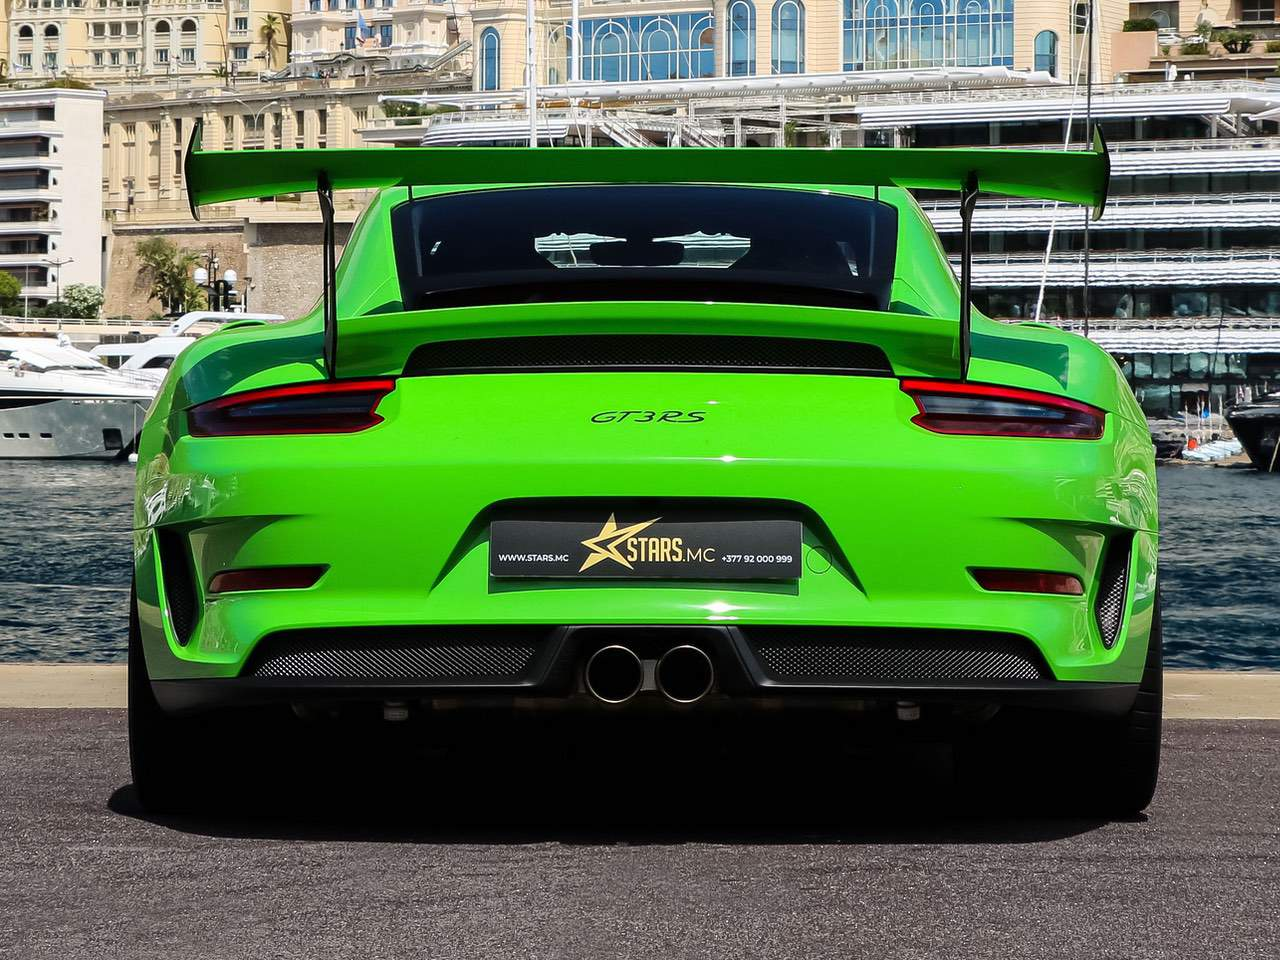 Porsche-911-Coupè-991-GT3-RS-PDK-9